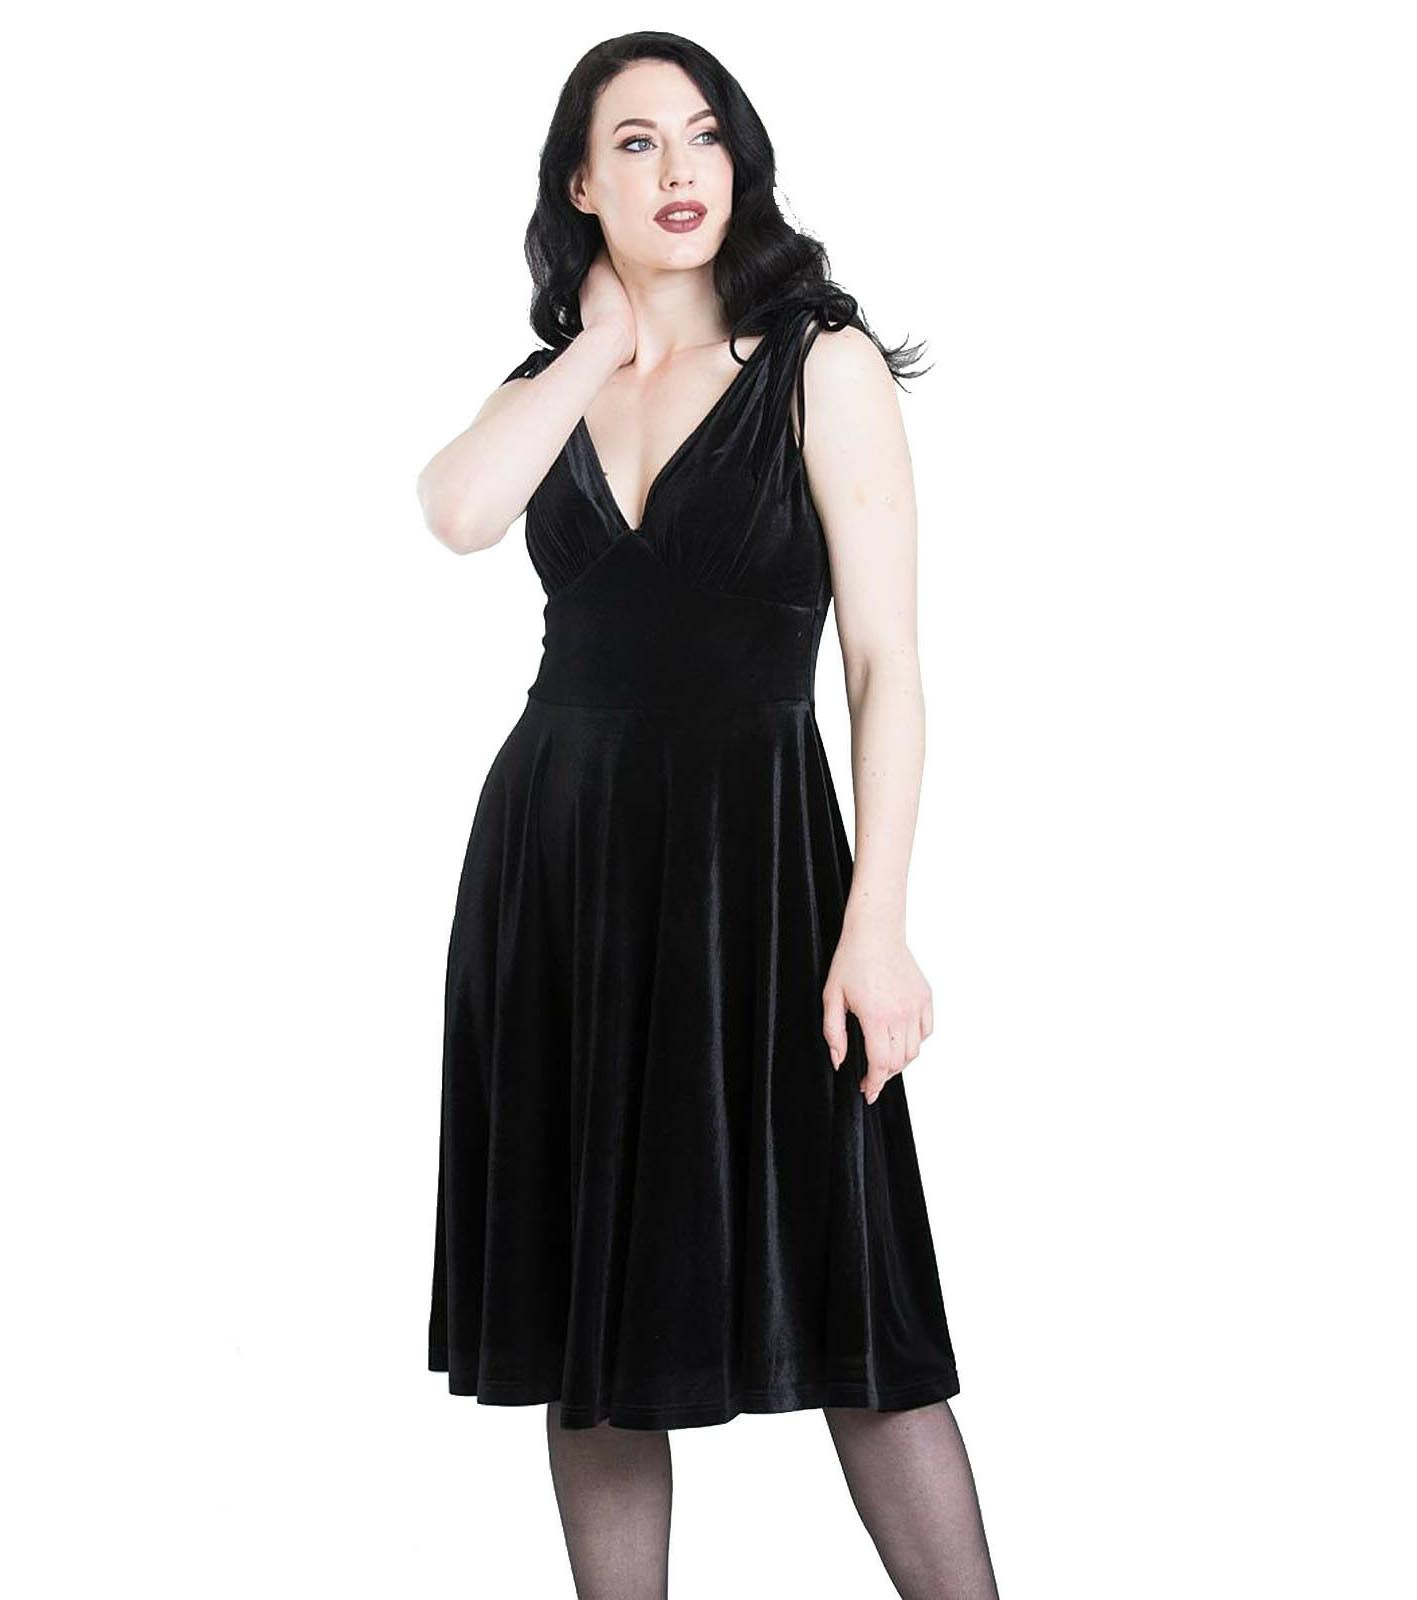 Hell-Bunny-40s-50s-Elegant-Pin-Up-Dress-MELINA-Crushed-Velvet-Black-All-Sizes thumbnail 19